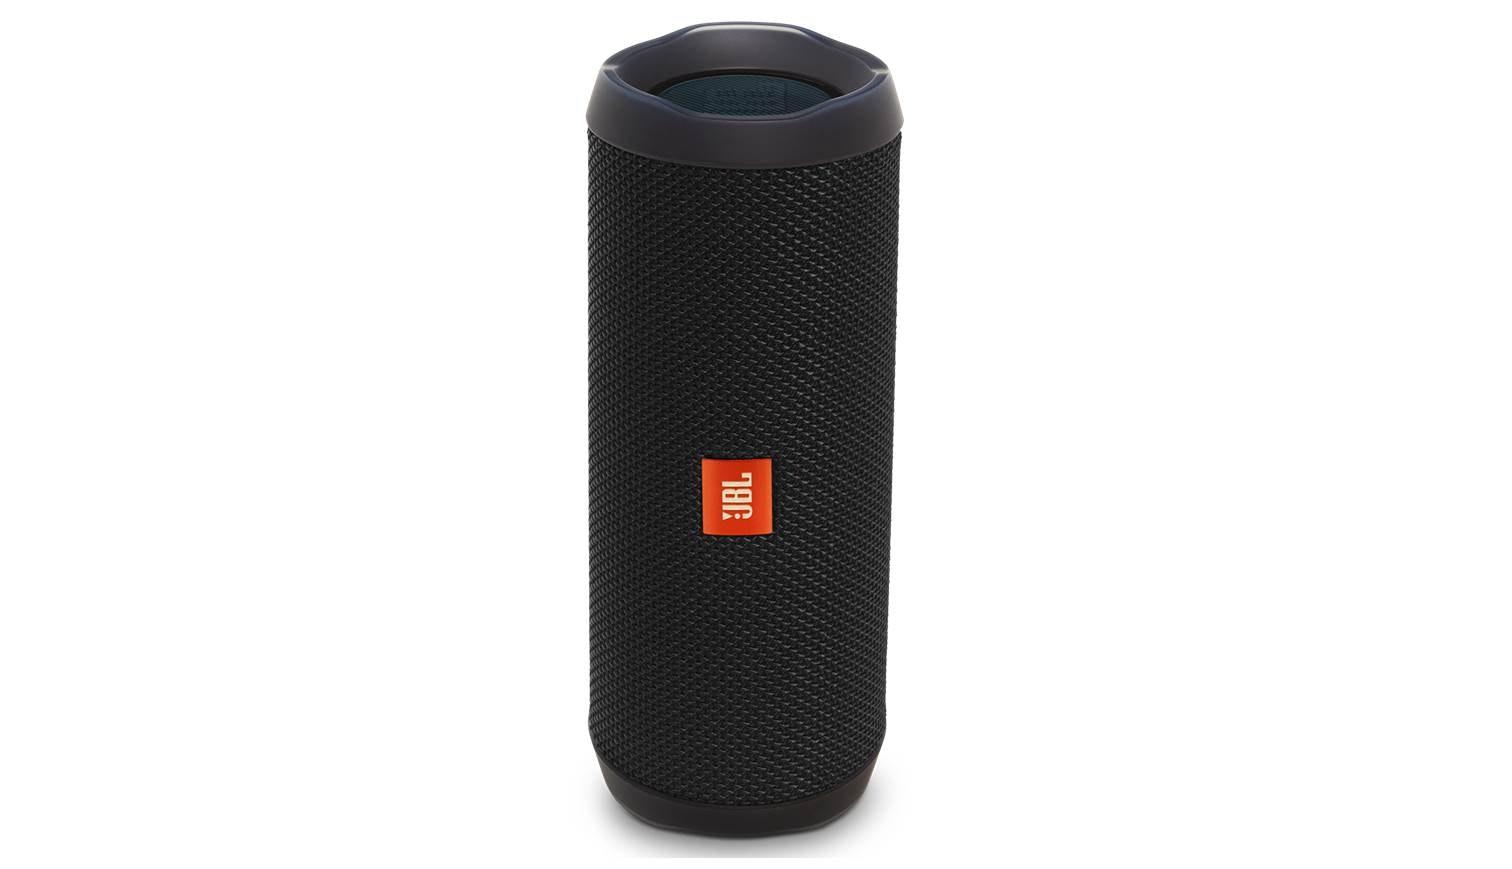 jbl portable speakers. jbl flip 4 wireless portable speaker - black jbl speakers